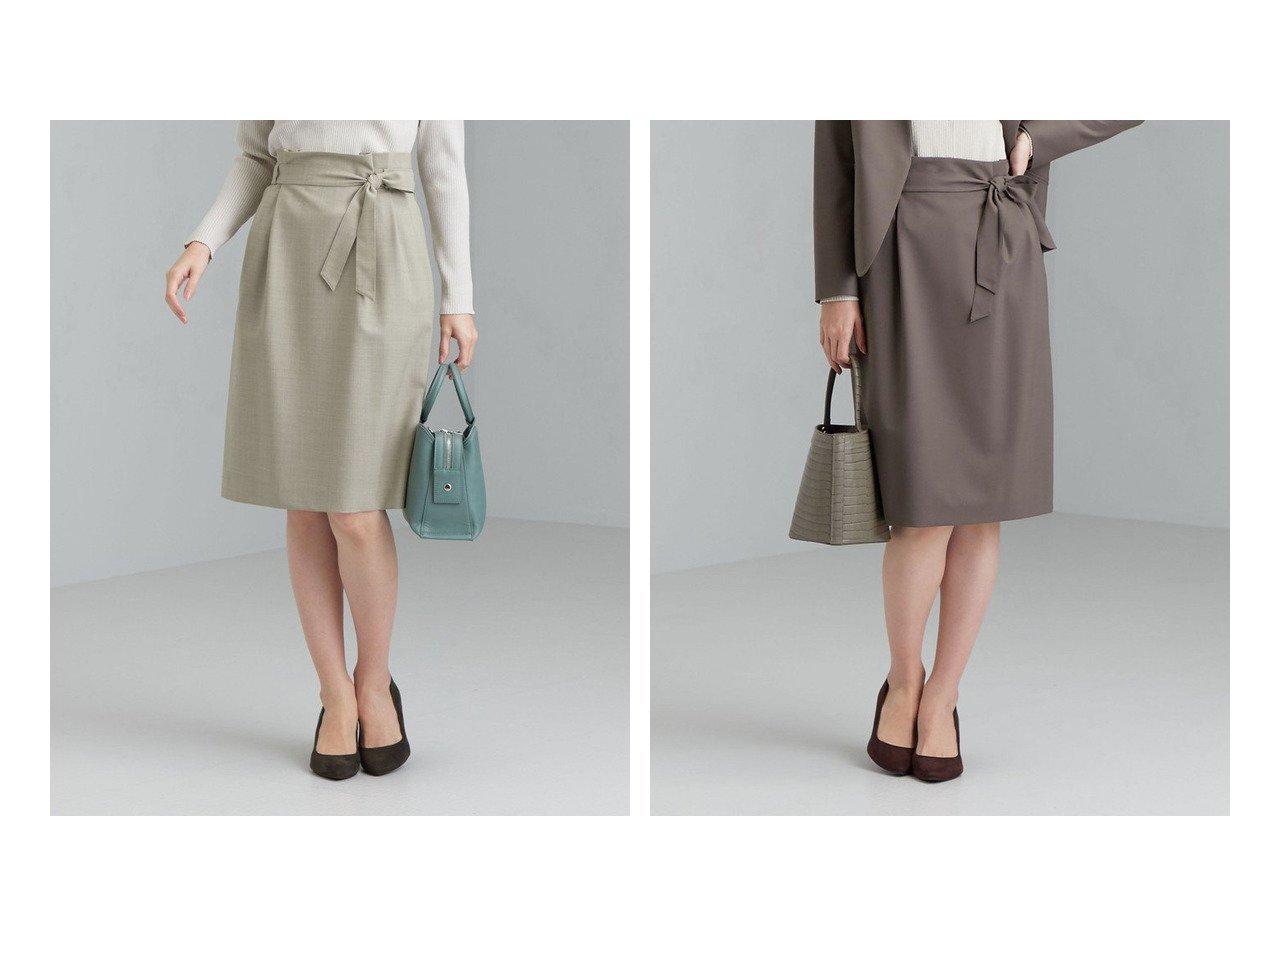 【green label relaxing / UNITED ARROWS/グリーンレーベル リラクシング / ユナイテッドアローズ】の手洗い可能 カチリラ D タック スカート -JJSP No05 ユナイテッドアローズのおすすめ!人気、トレンド・レディースファッションの通販 おすすめで人気の流行・トレンド、ファッションの通販商品 メンズファッション・キッズファッション・インテリア・家具・レディースファッション・服の通販 founy(ファニー) https://founy.com/ ファッション Fashion レディースファッション WOMEN スカート Skirt ストレッチ セットアップ タイトスカート 定番 Standard リラックス NEW・新作・新着・新入荷 New Arrivals おすすめ Recommend |ID:crp329100000021464